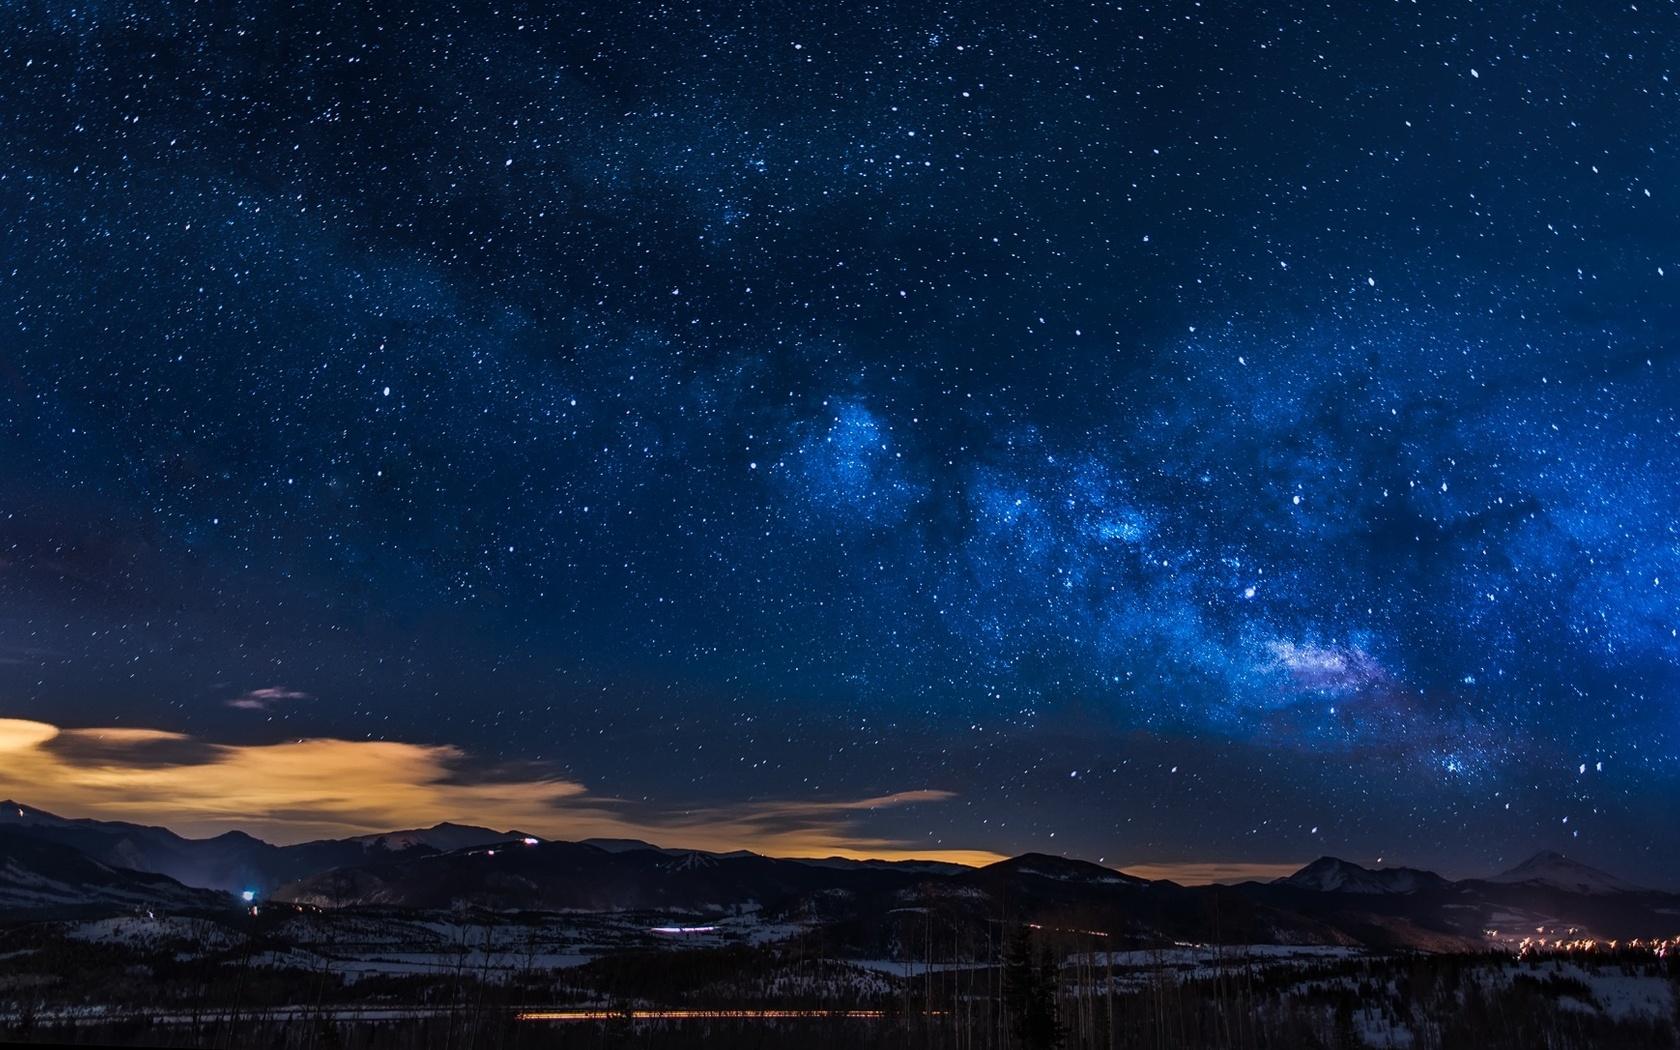 небо, звезды, горы, колорадо